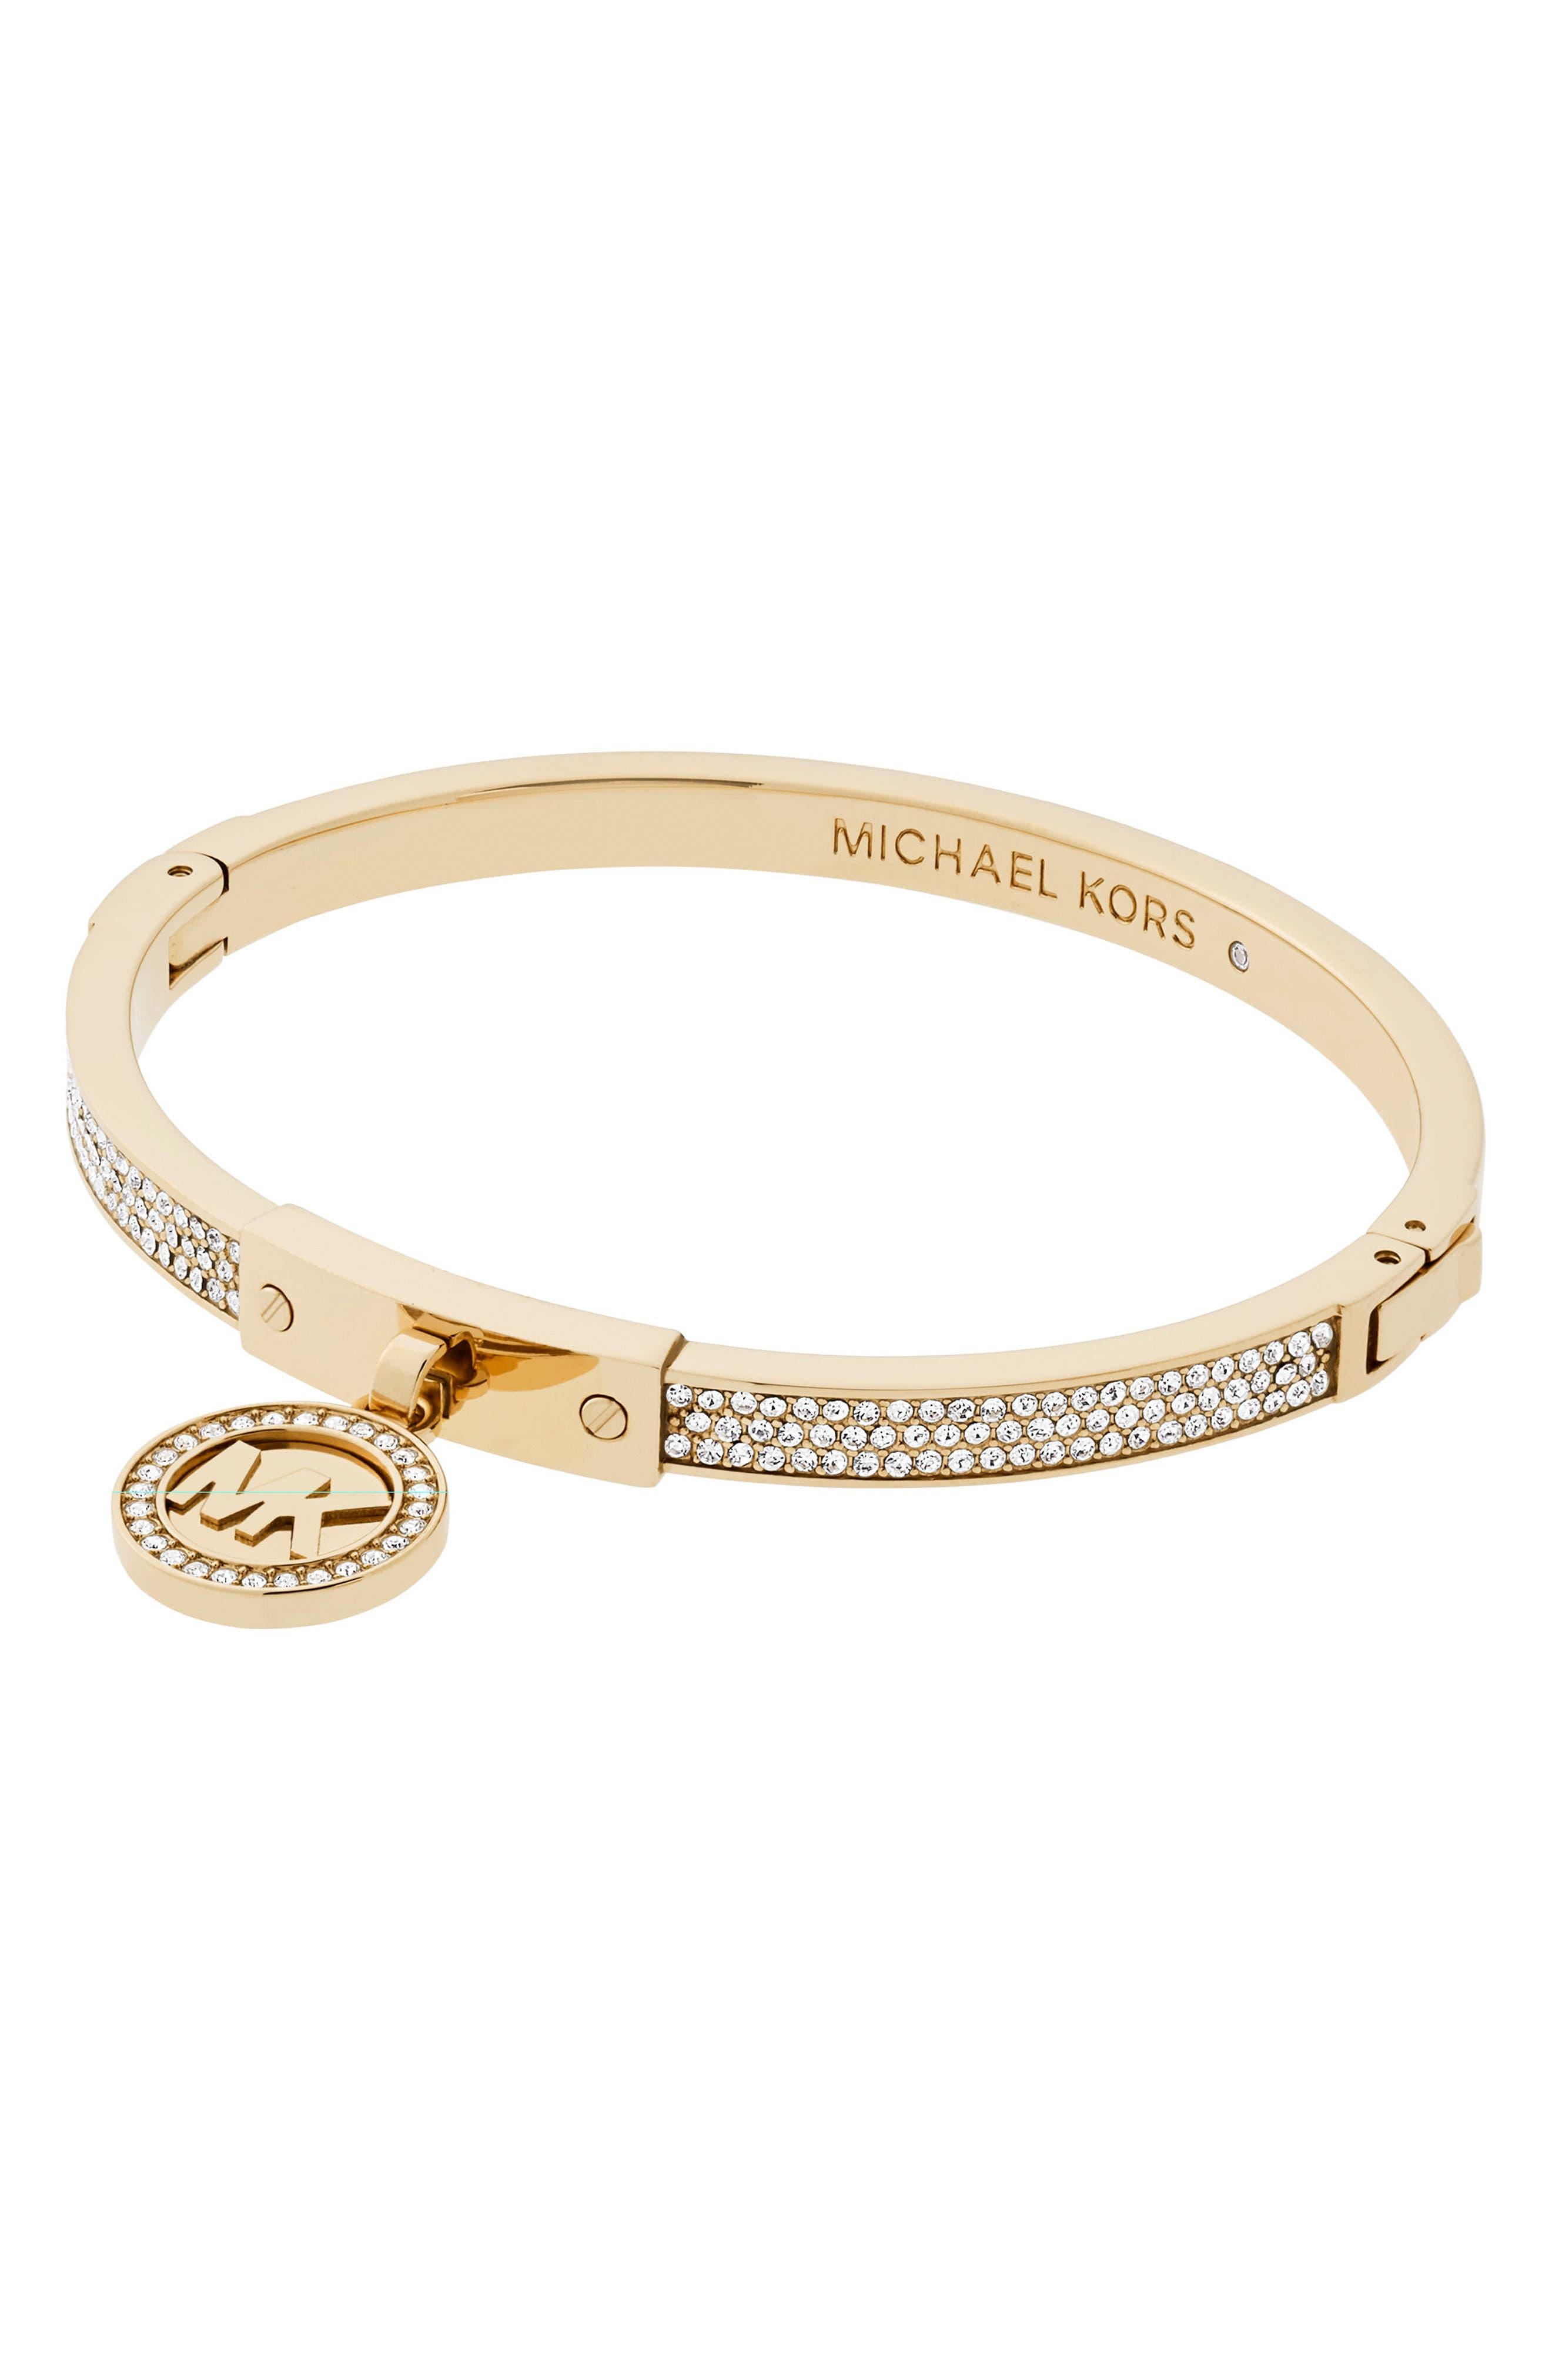 Michael Kors Crsytal Bracelet